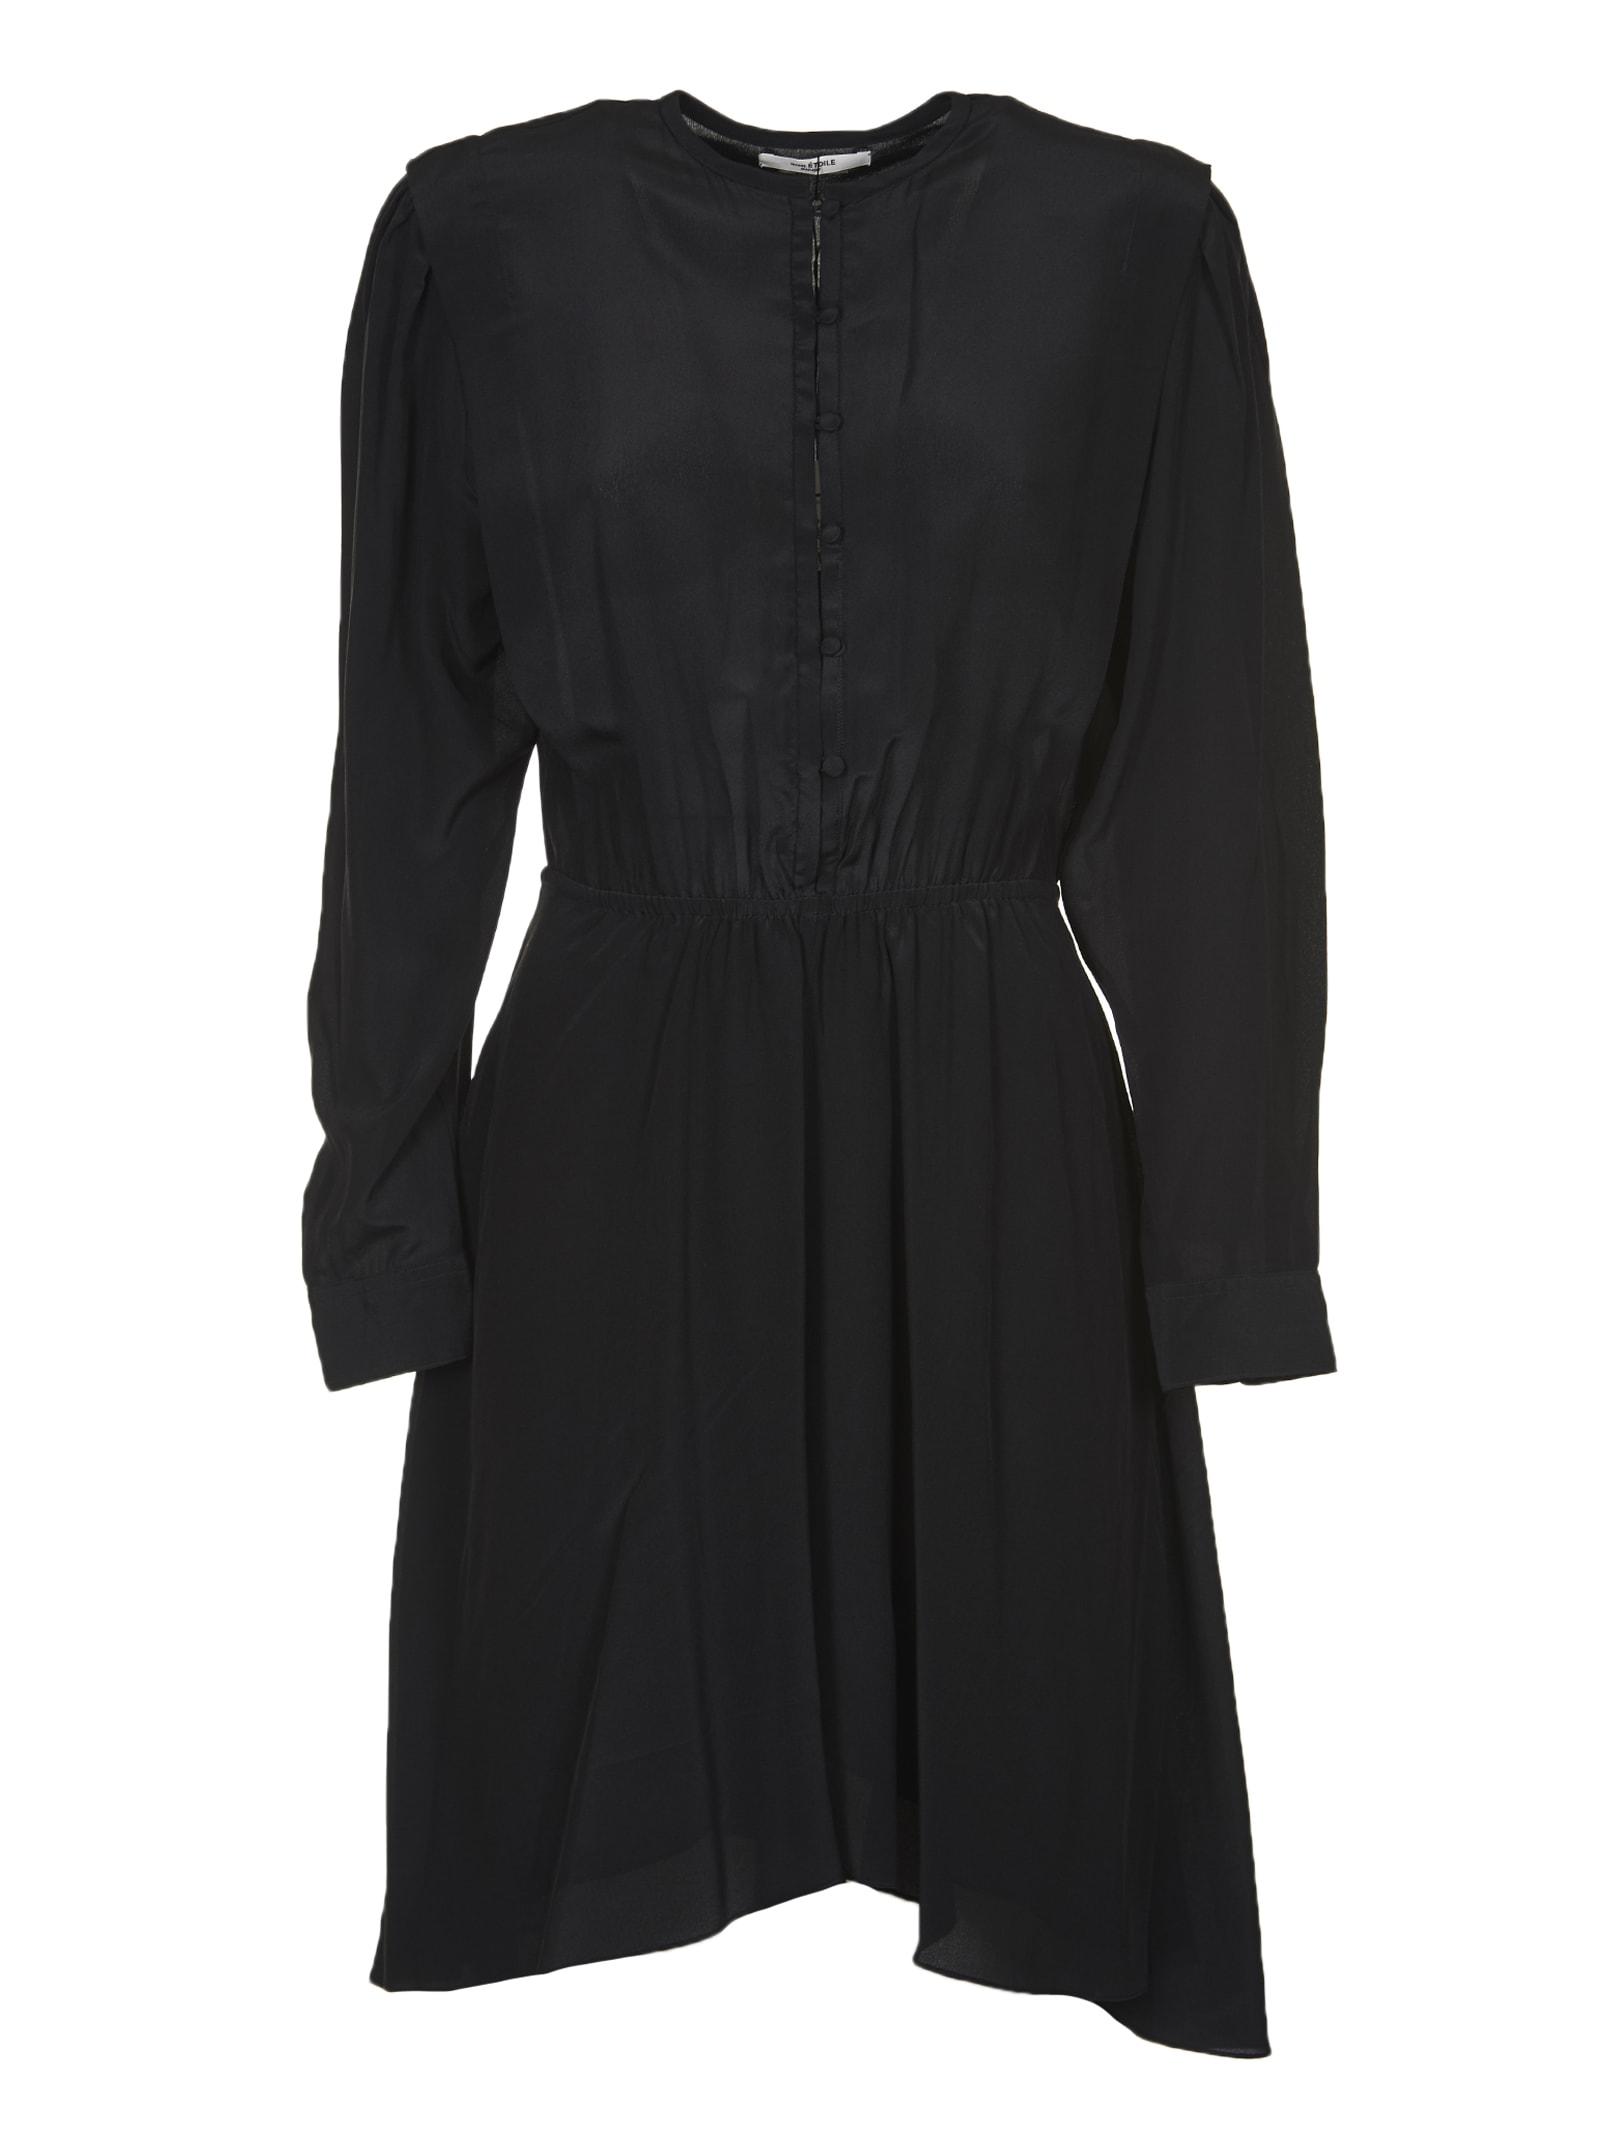 Buy Isabel Marant Étoile Isabell Marant Dress online, shop Isabel Marant Étoile with free shipping